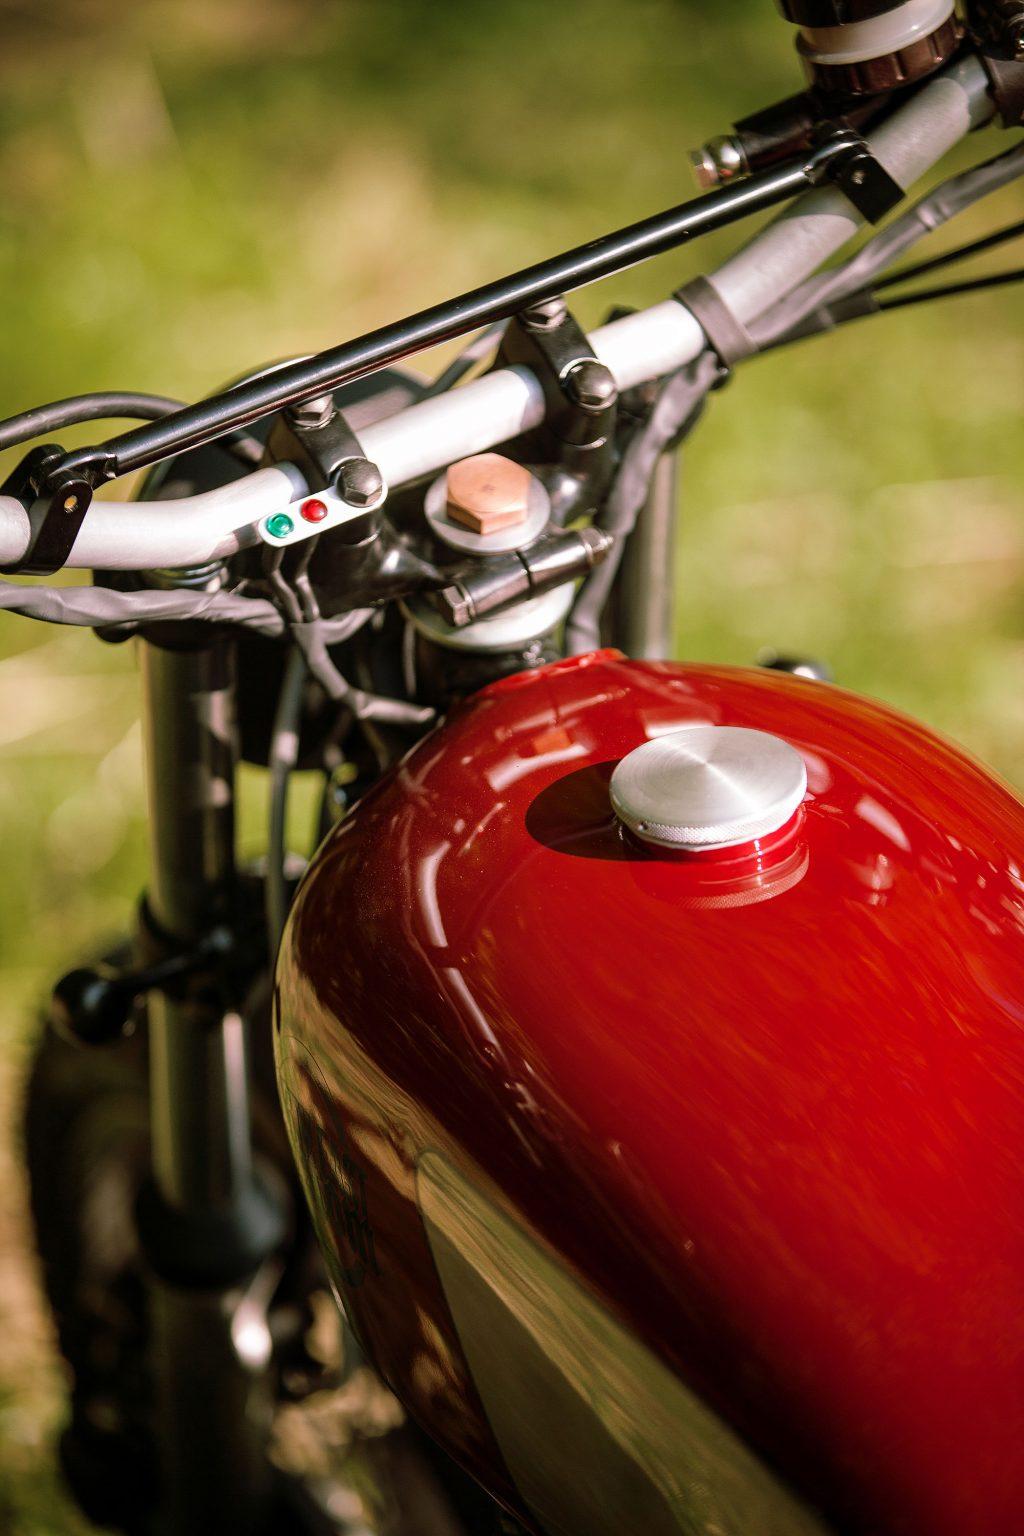 northeastcustom_kawasakiz400_scrambler_bike_italy